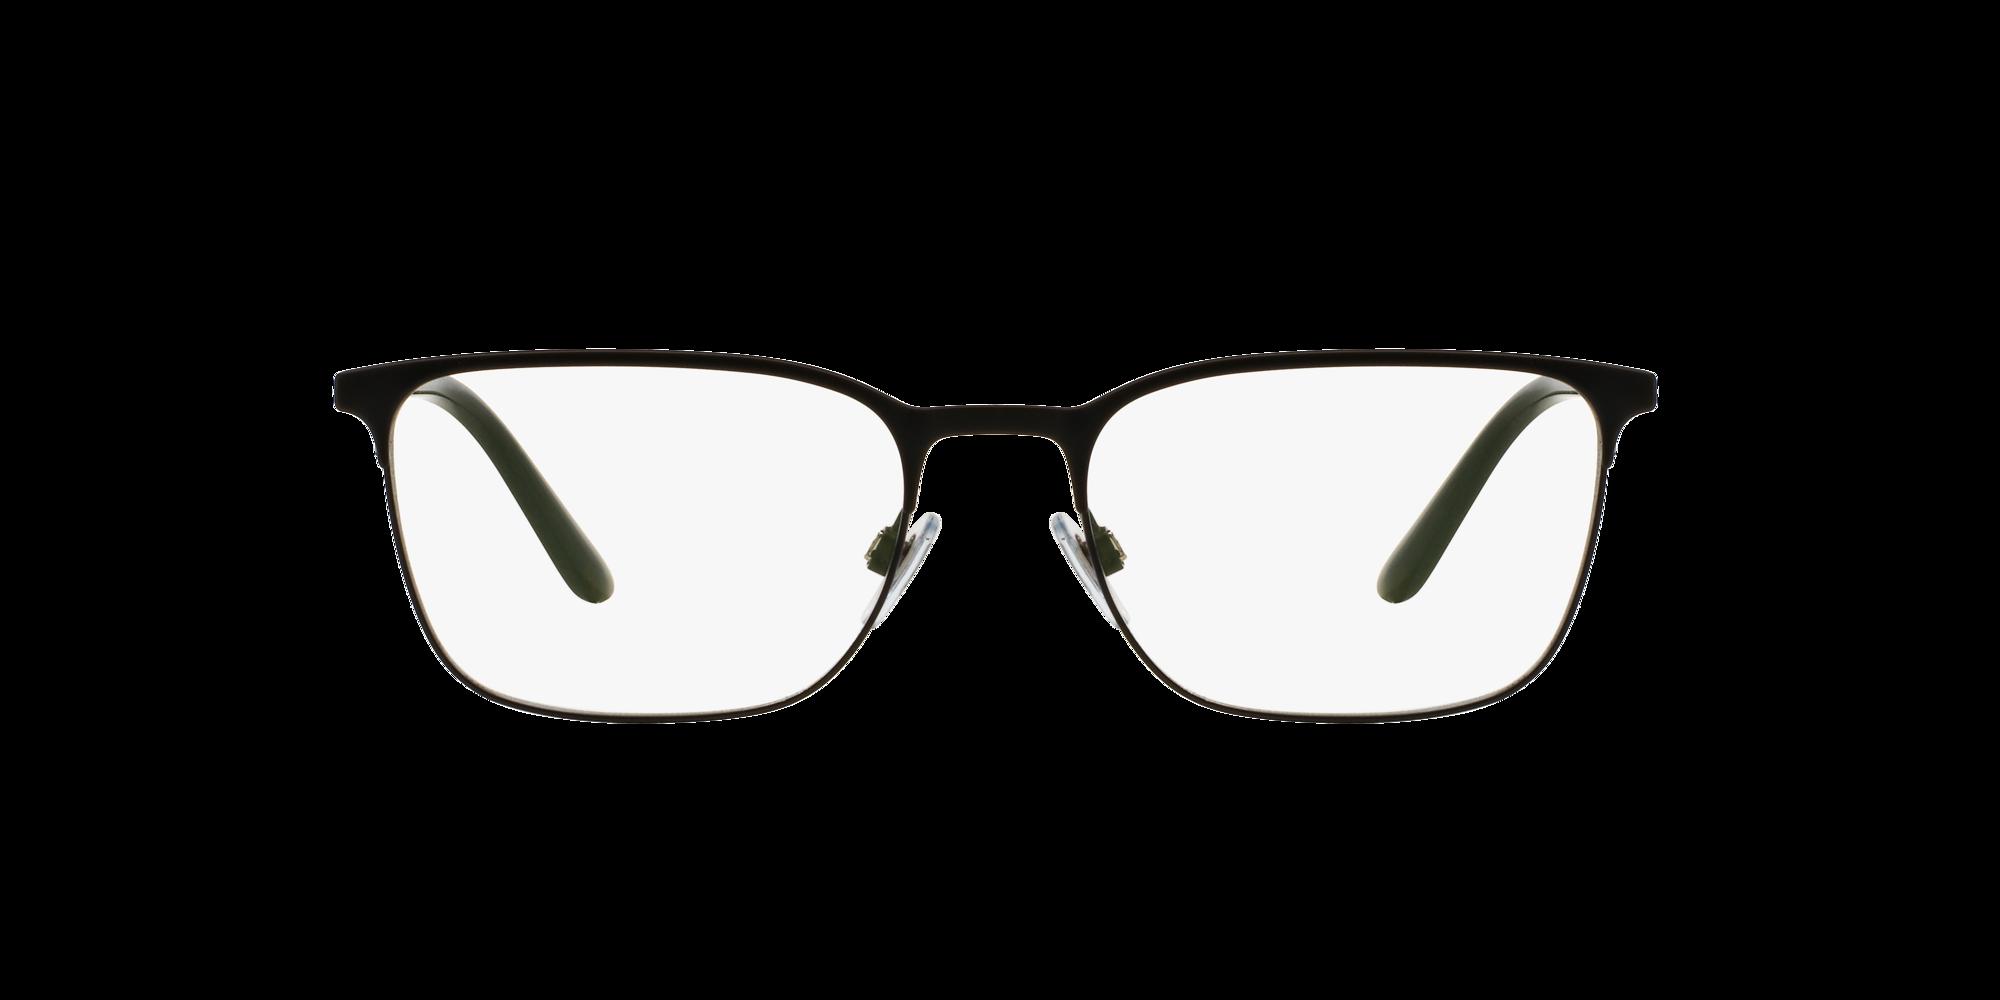 Image for AR5054 from LensCrafters | Glasses, Prescription Glasses Online, Eyewear